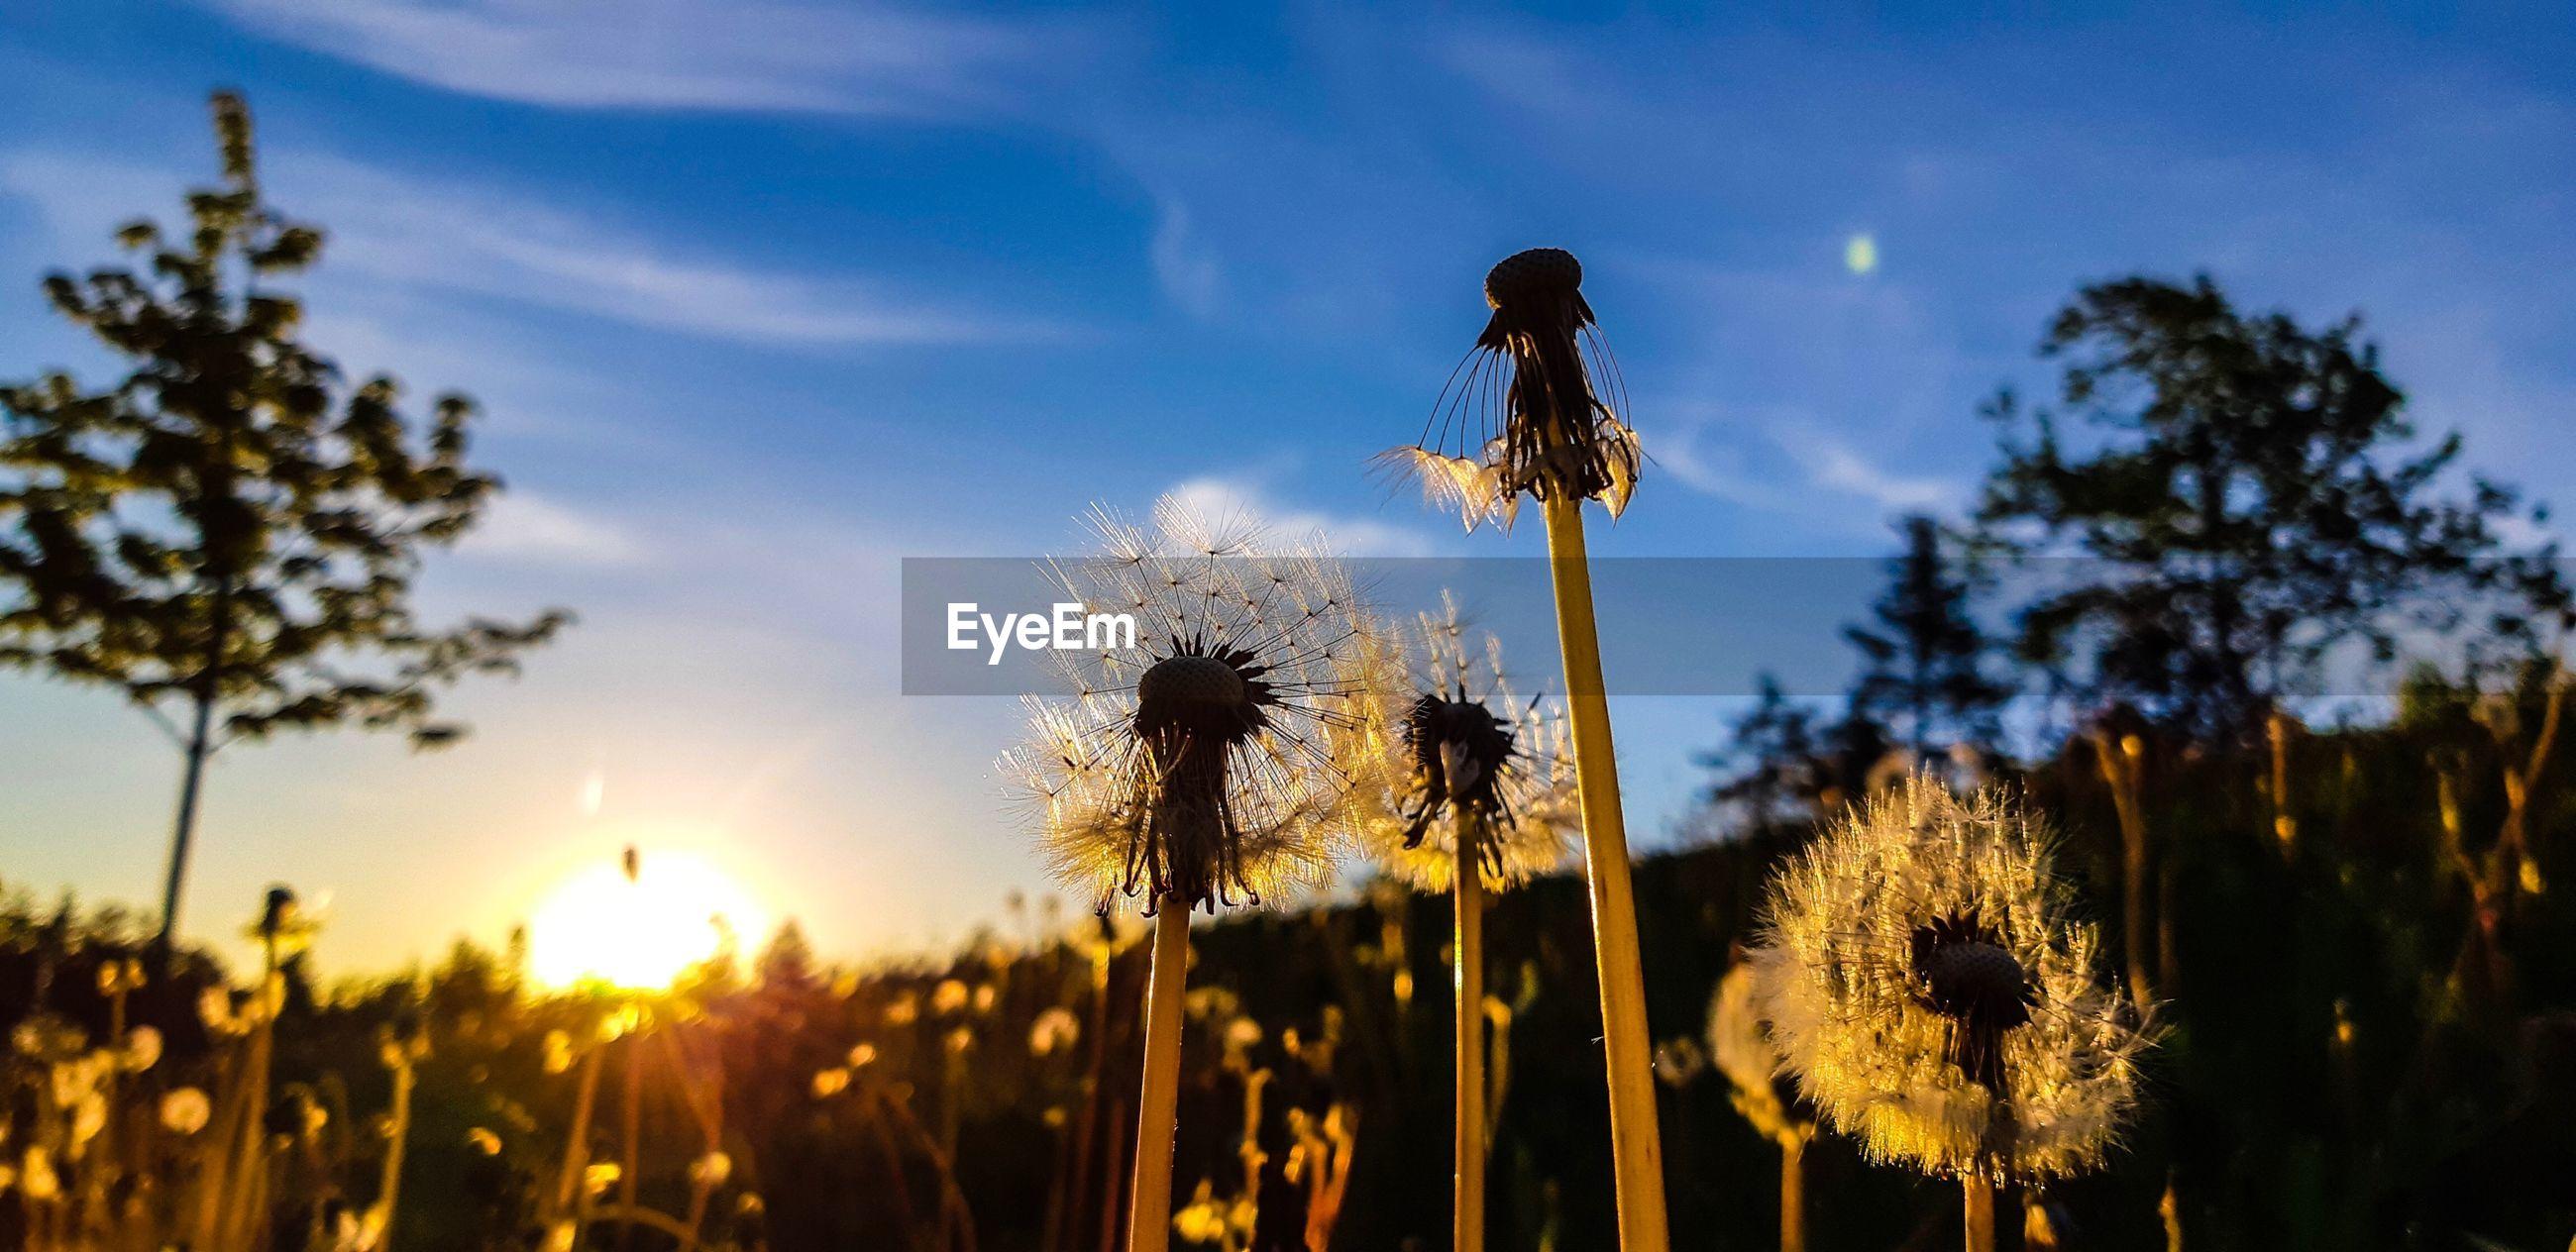 CLOSE-UP OF DANDELION FLOWER ON FIELD AGAINST SKY